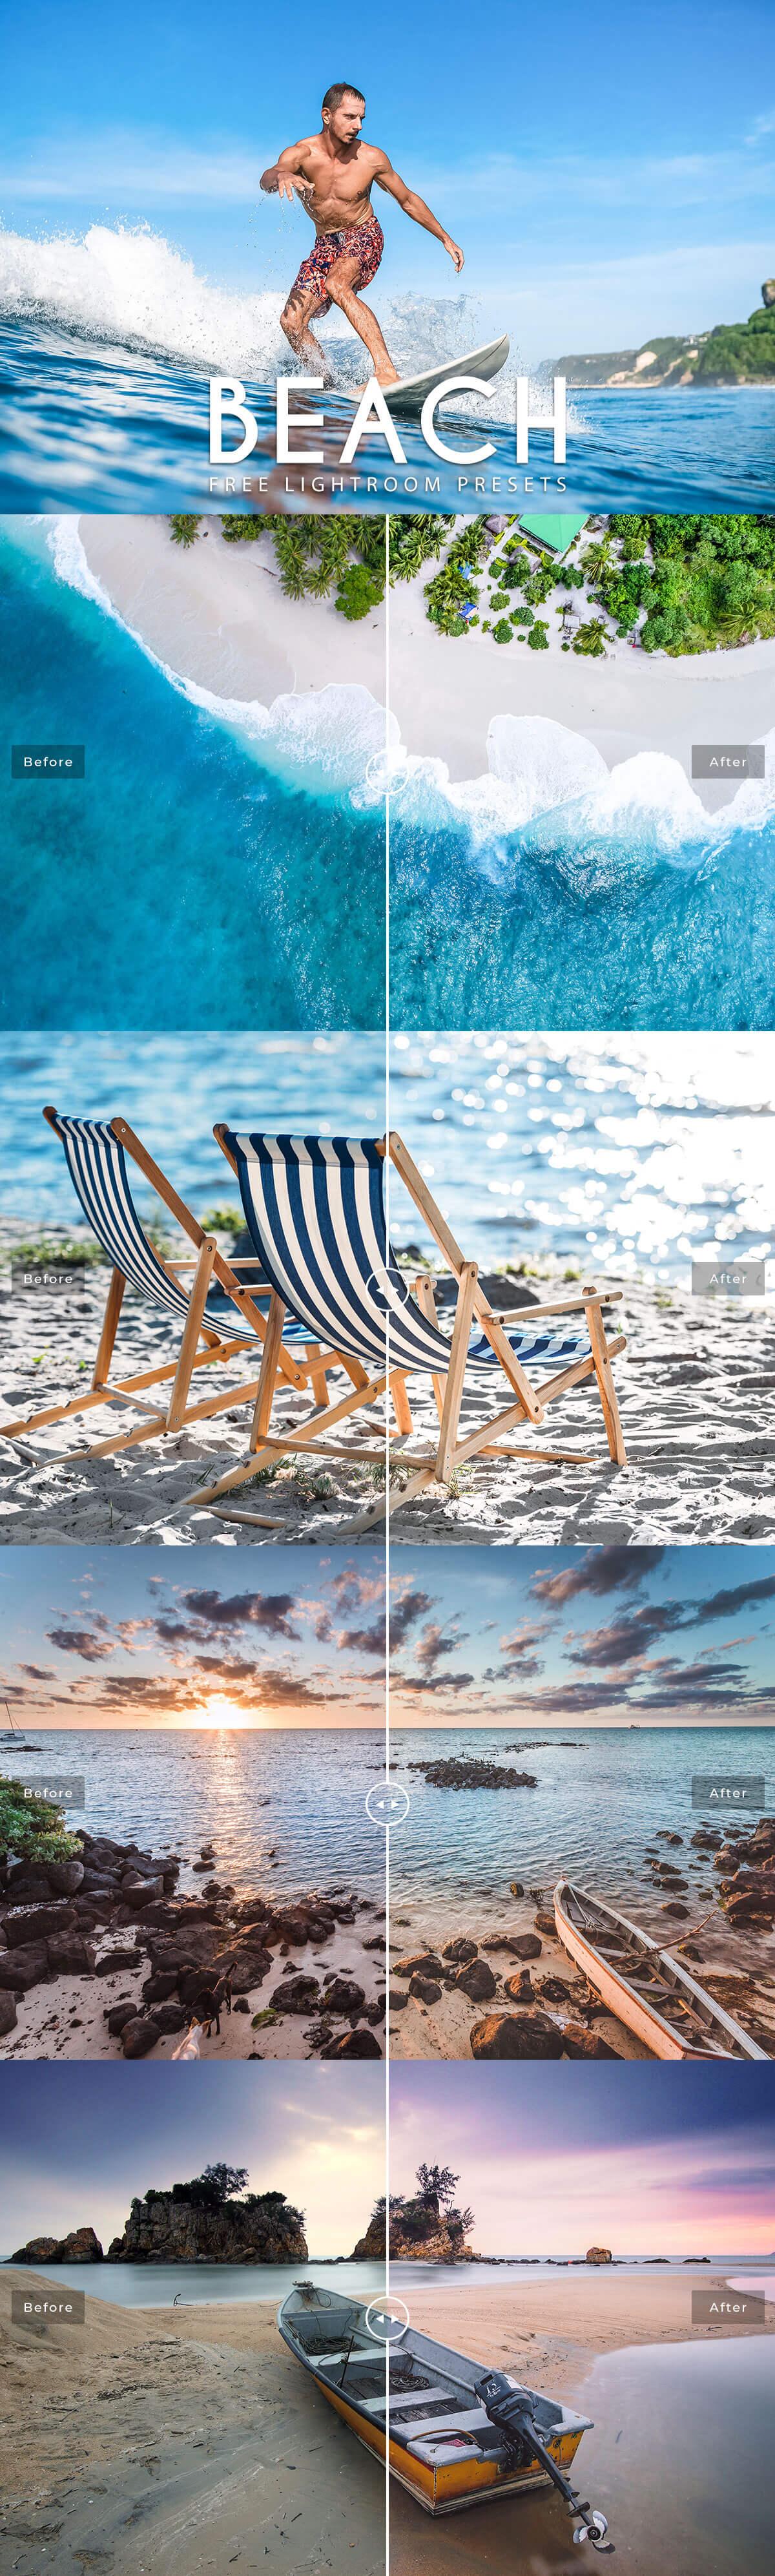 Free-Beach-Lightroom-Presets.jpg